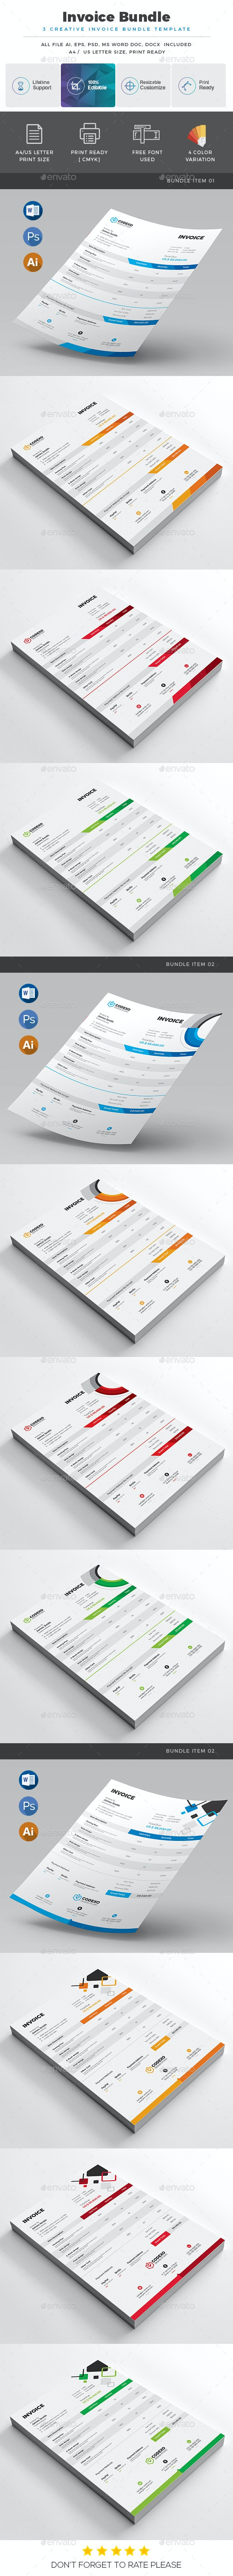 Invoice Bundle - Stationery Print Templates